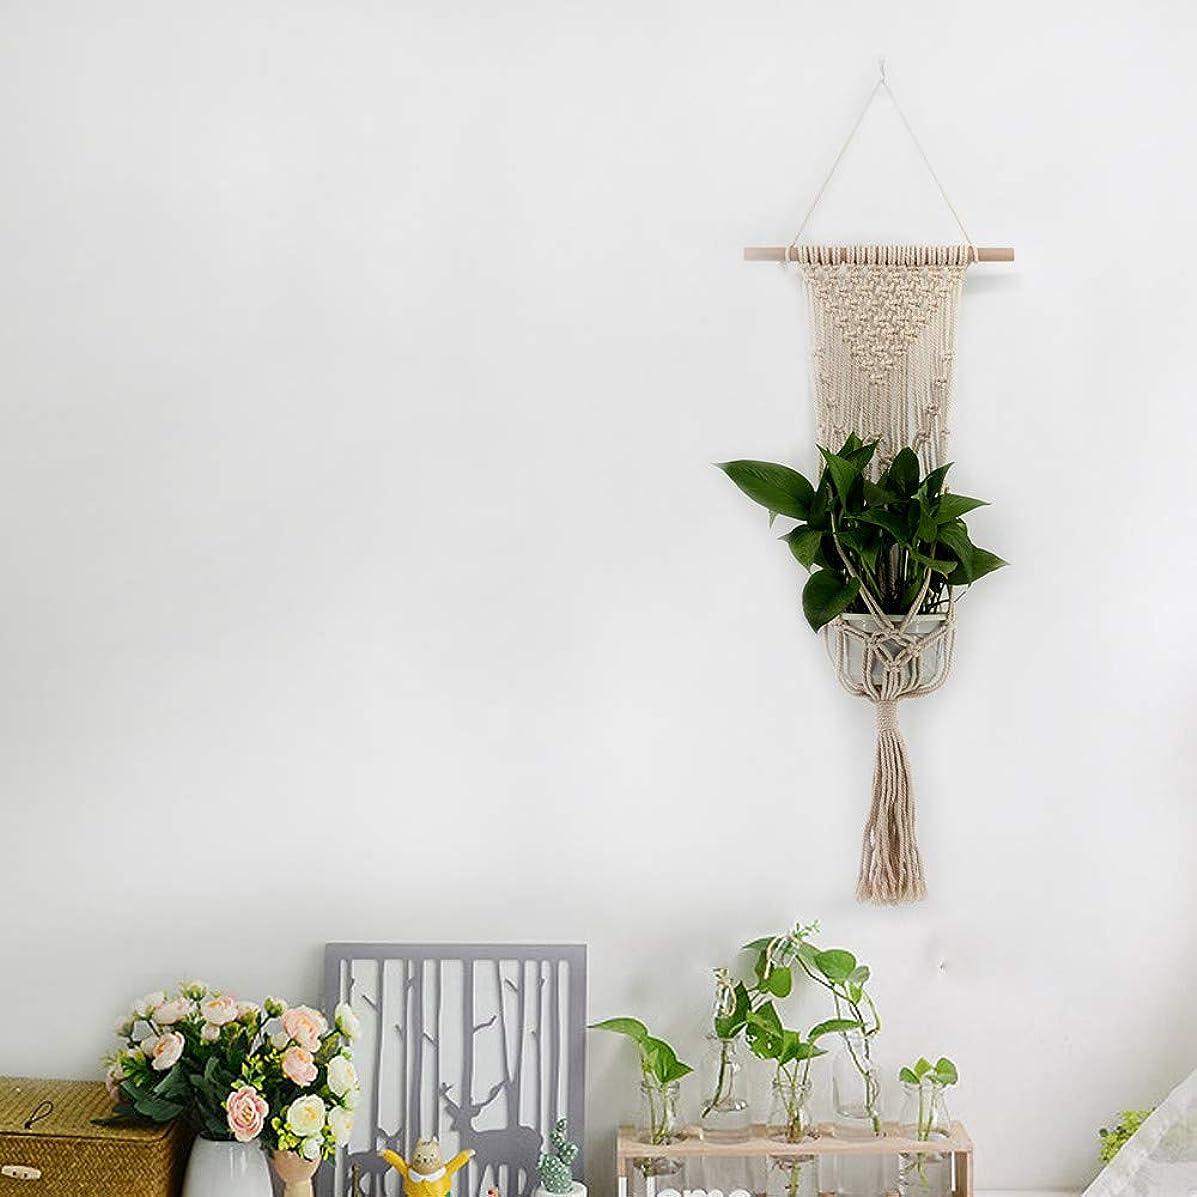 Maikouhai Macrame Rope Plant Hanger Garden Flower Pot Holder Hanging Basket Decoration for Garden, Landscape, Office, Hotel, Balcony - Cotton Rope